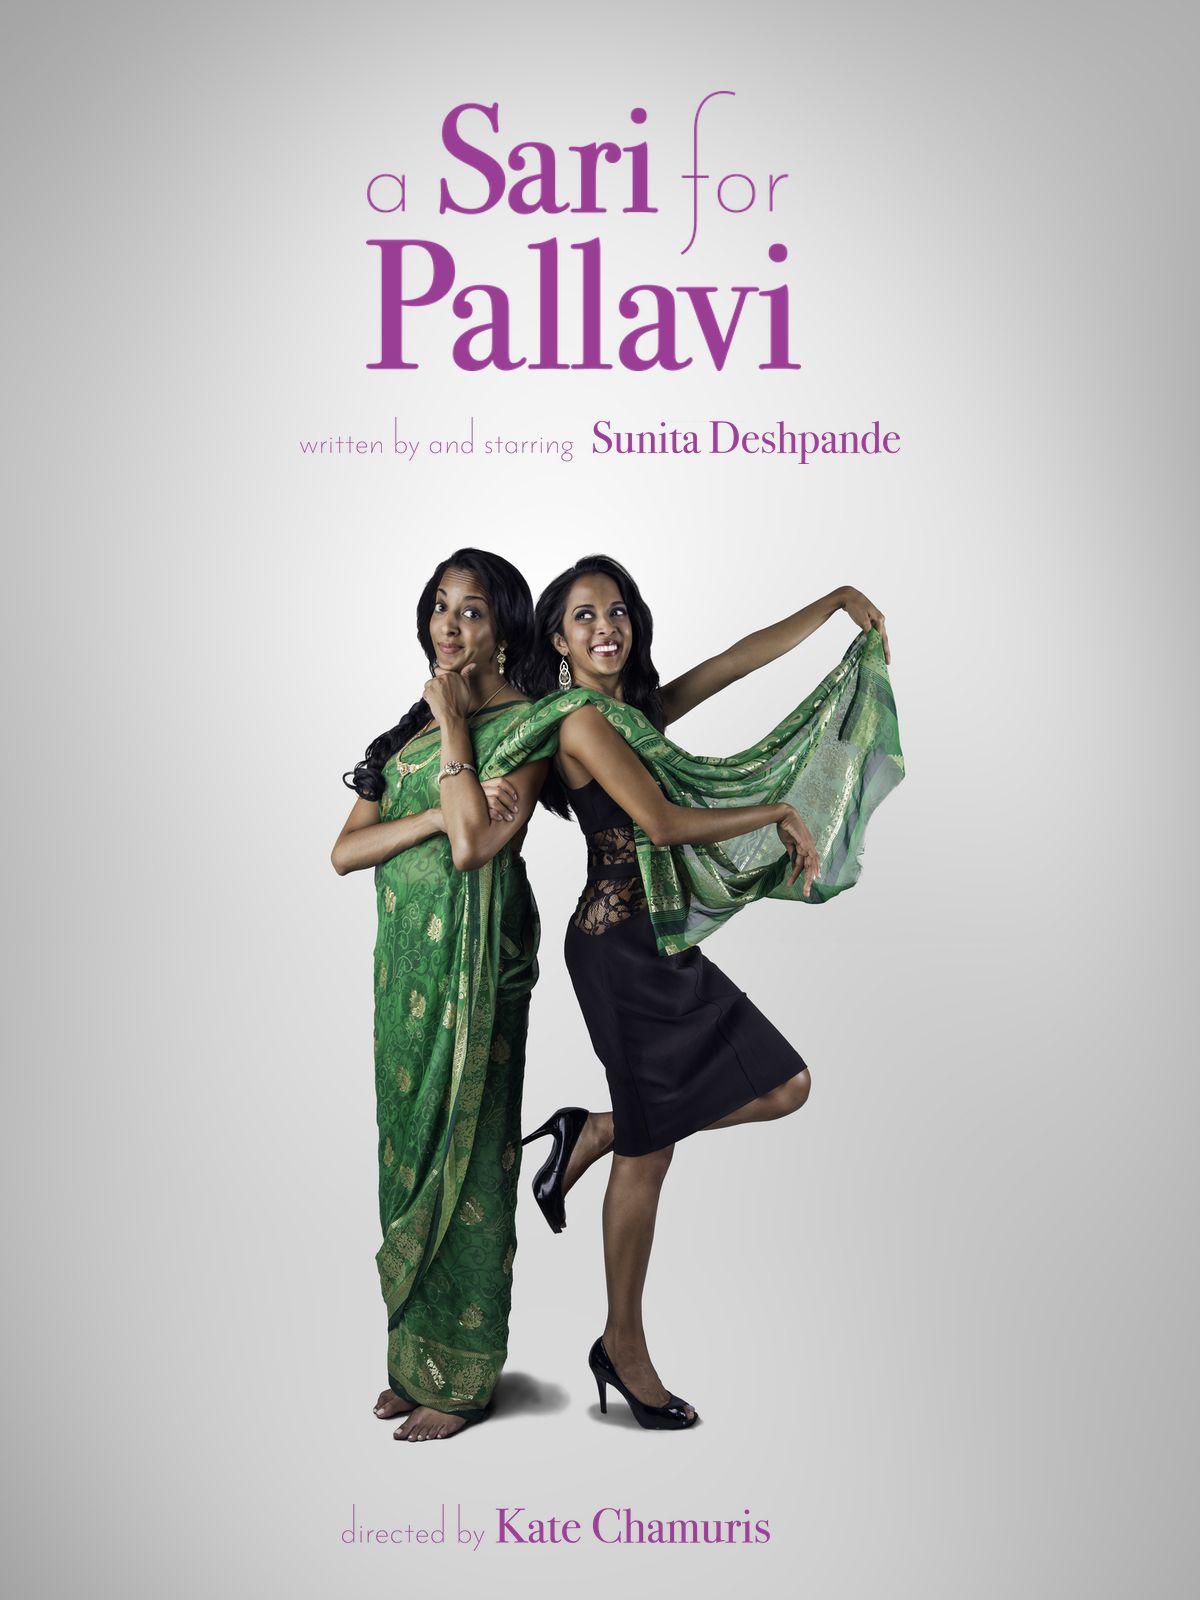 A SARI FOR PALLAVI featuring Sunita Deshpande